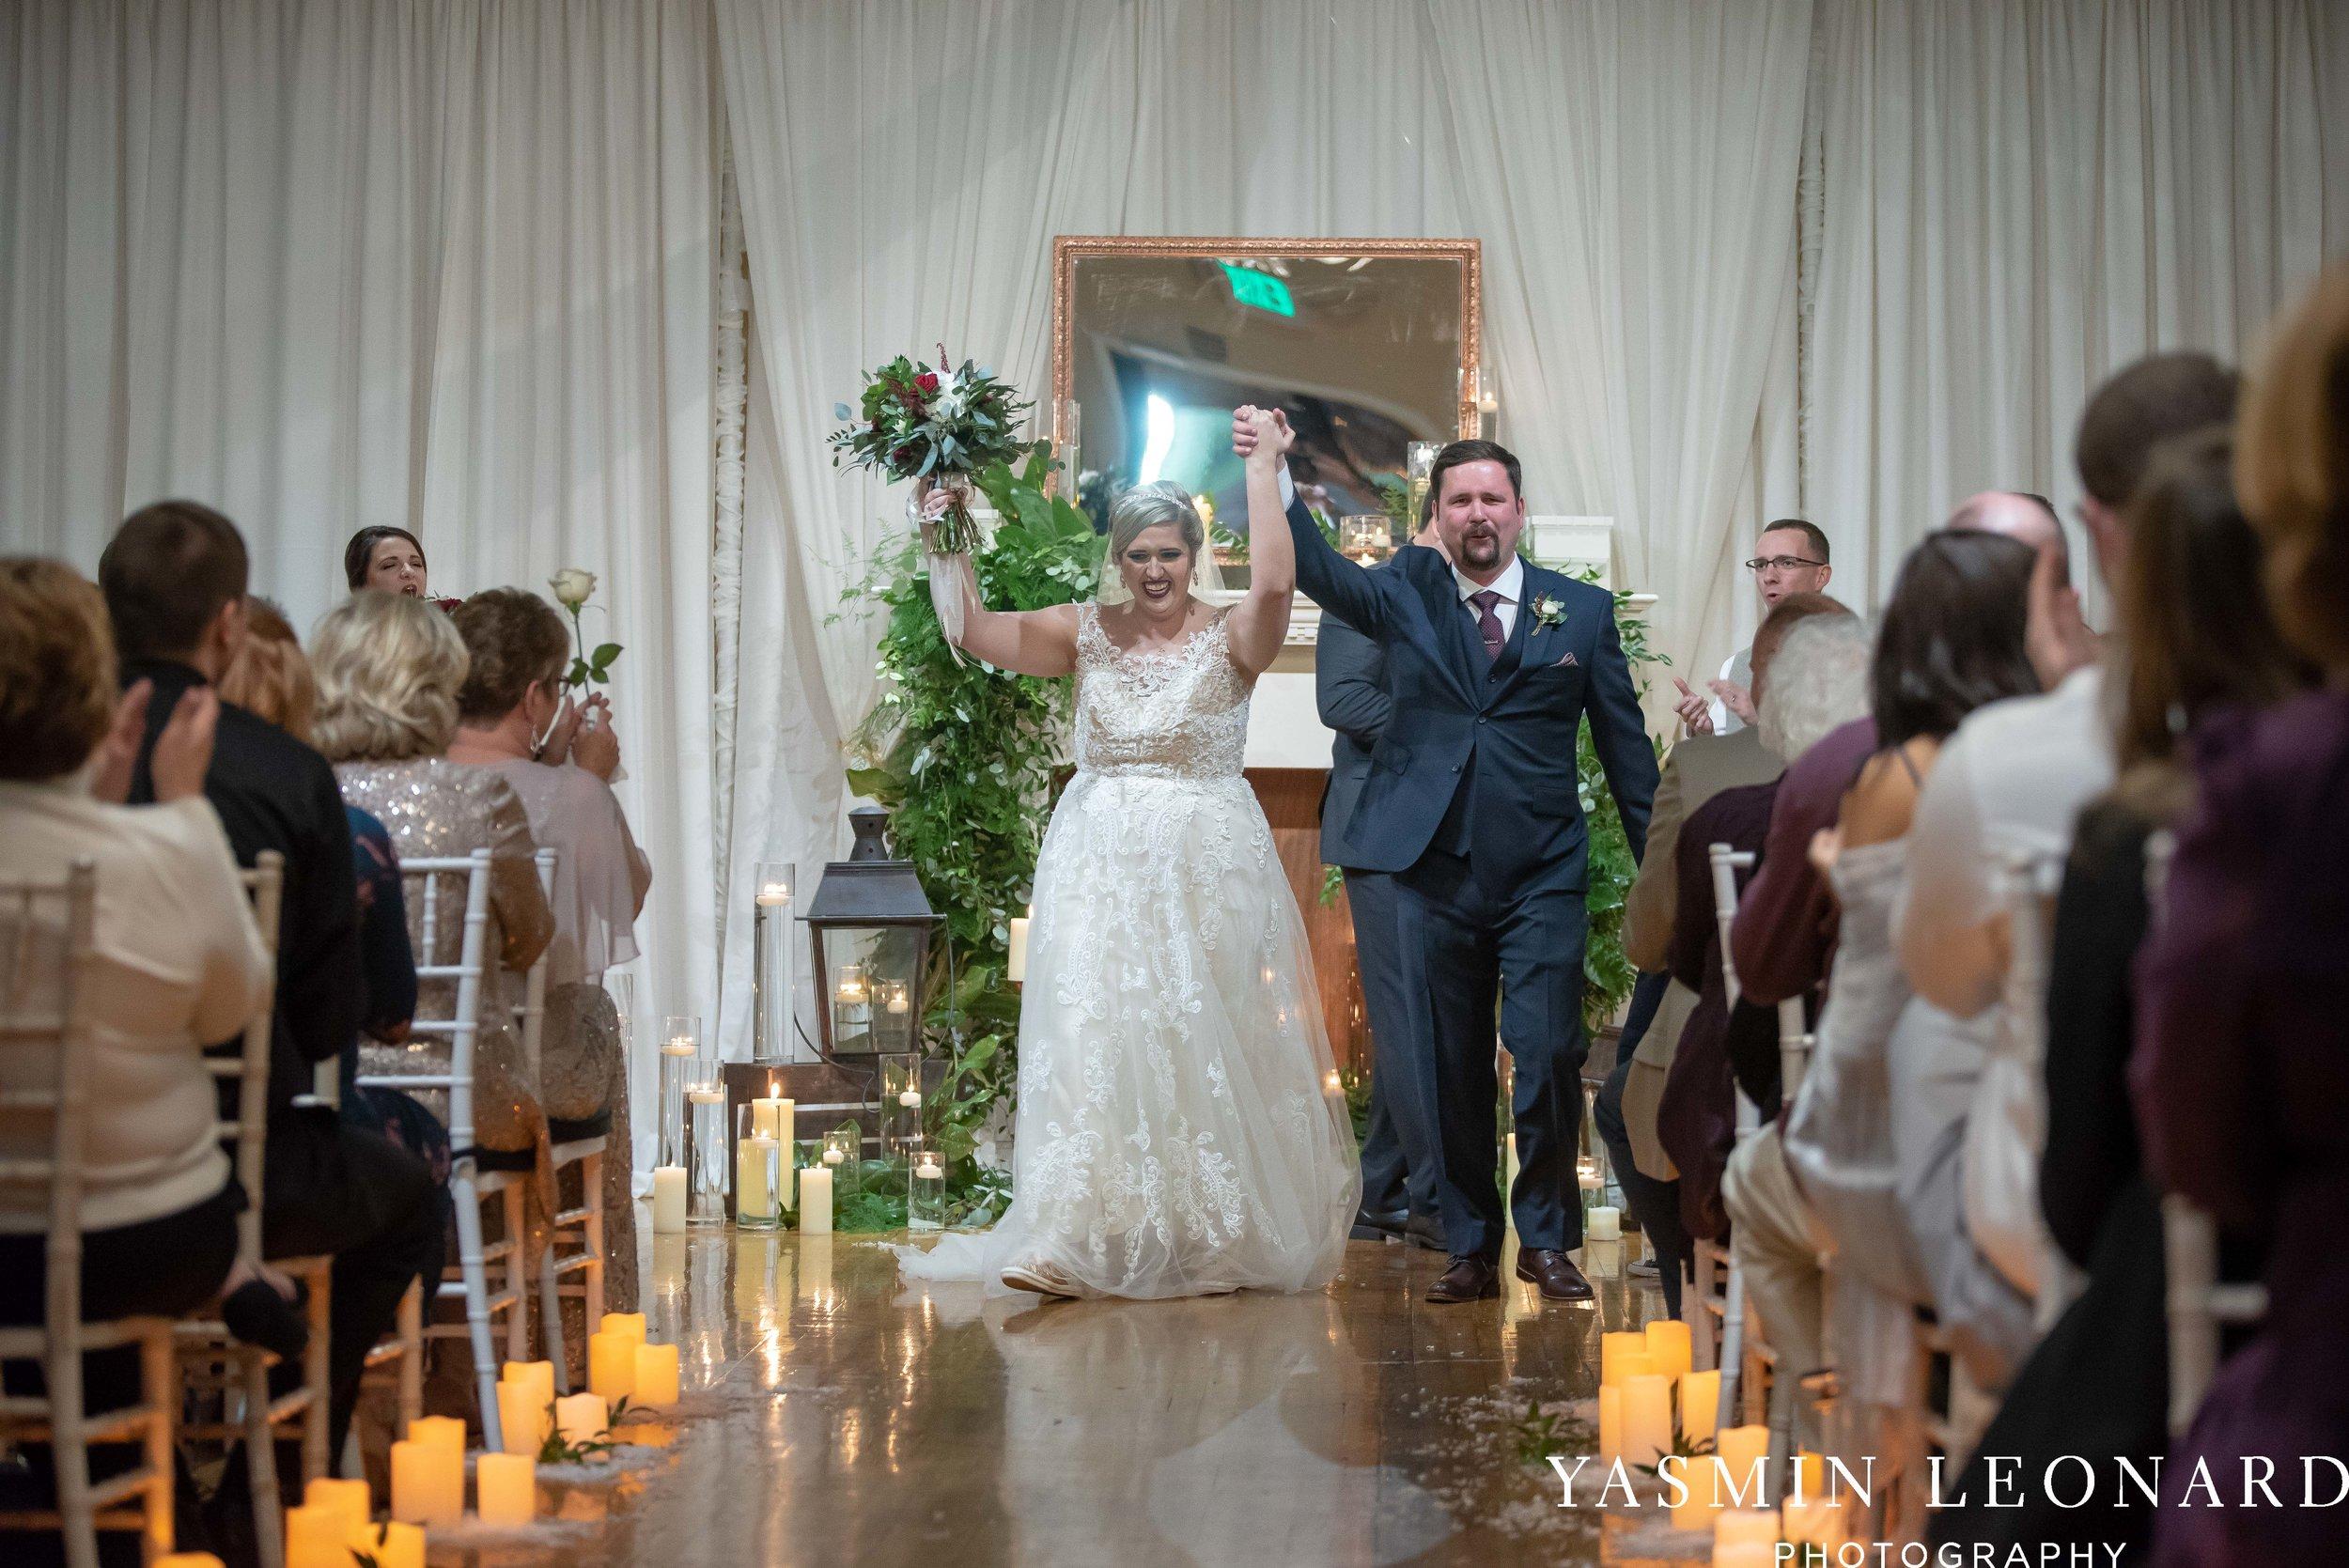 Rebekah and Matt - 105 Worth Event Centre - Yasmin Leonard Photography - Asheboro Wedding - NC Wedding - High Point Weddings - Triad Weddings - Winter Wedding-30.jpg